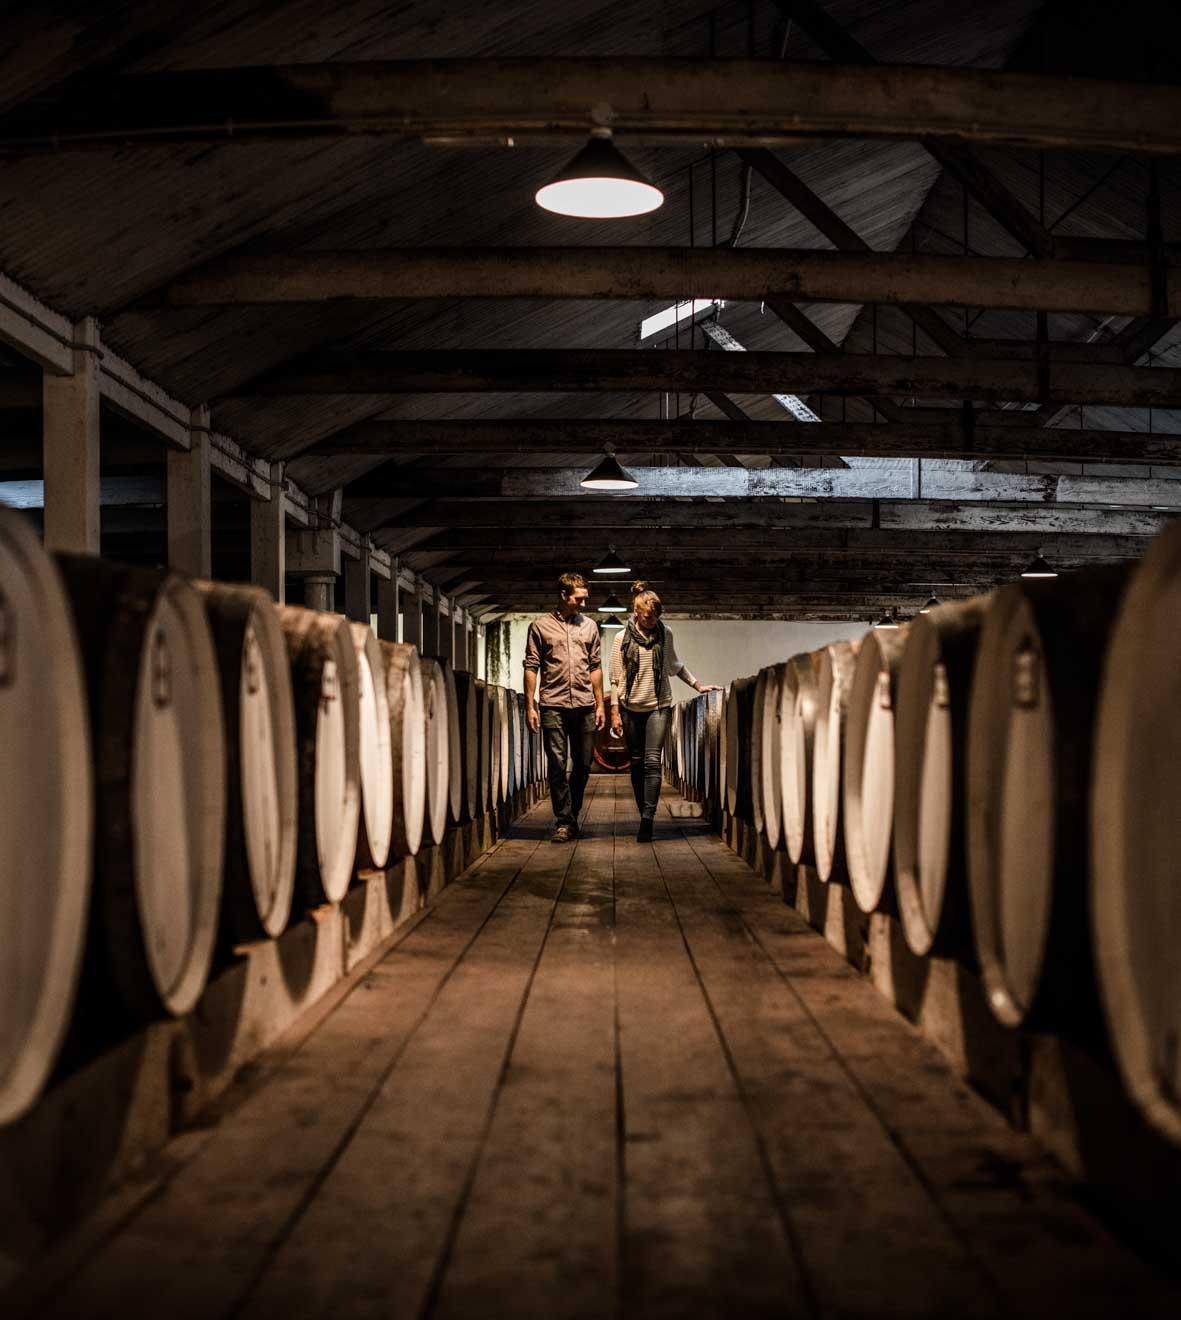 barossa valley wineries - Seppeltsfield Winery, Barossa Valley, SA